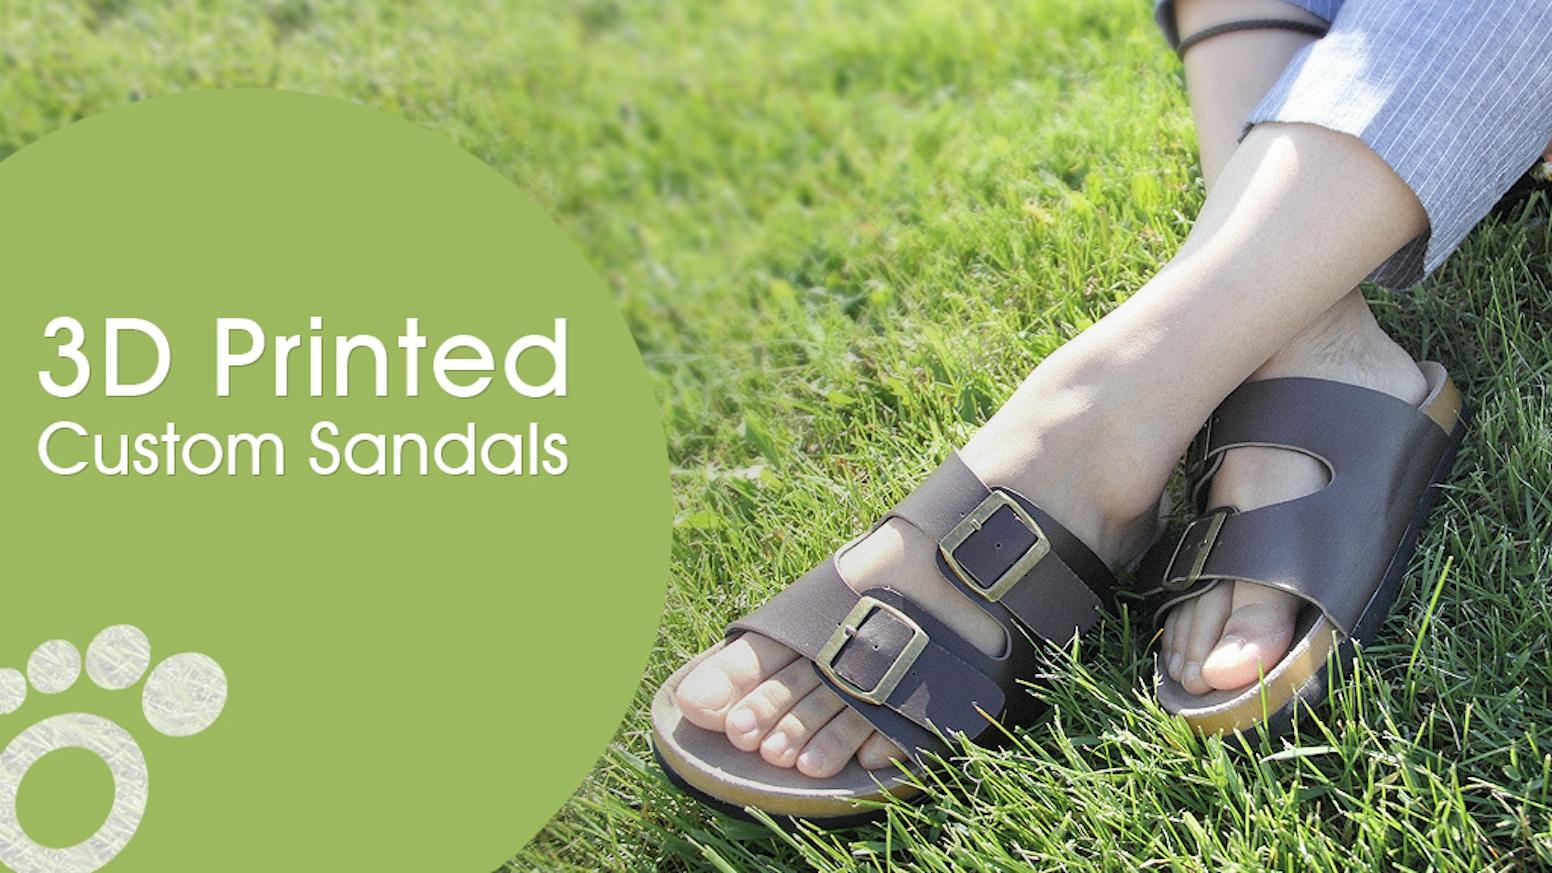 dab7887b612c Join The Footwear Revolution - 3D Printed Custom Sandals. World s first  custom sandals with mass customization ...